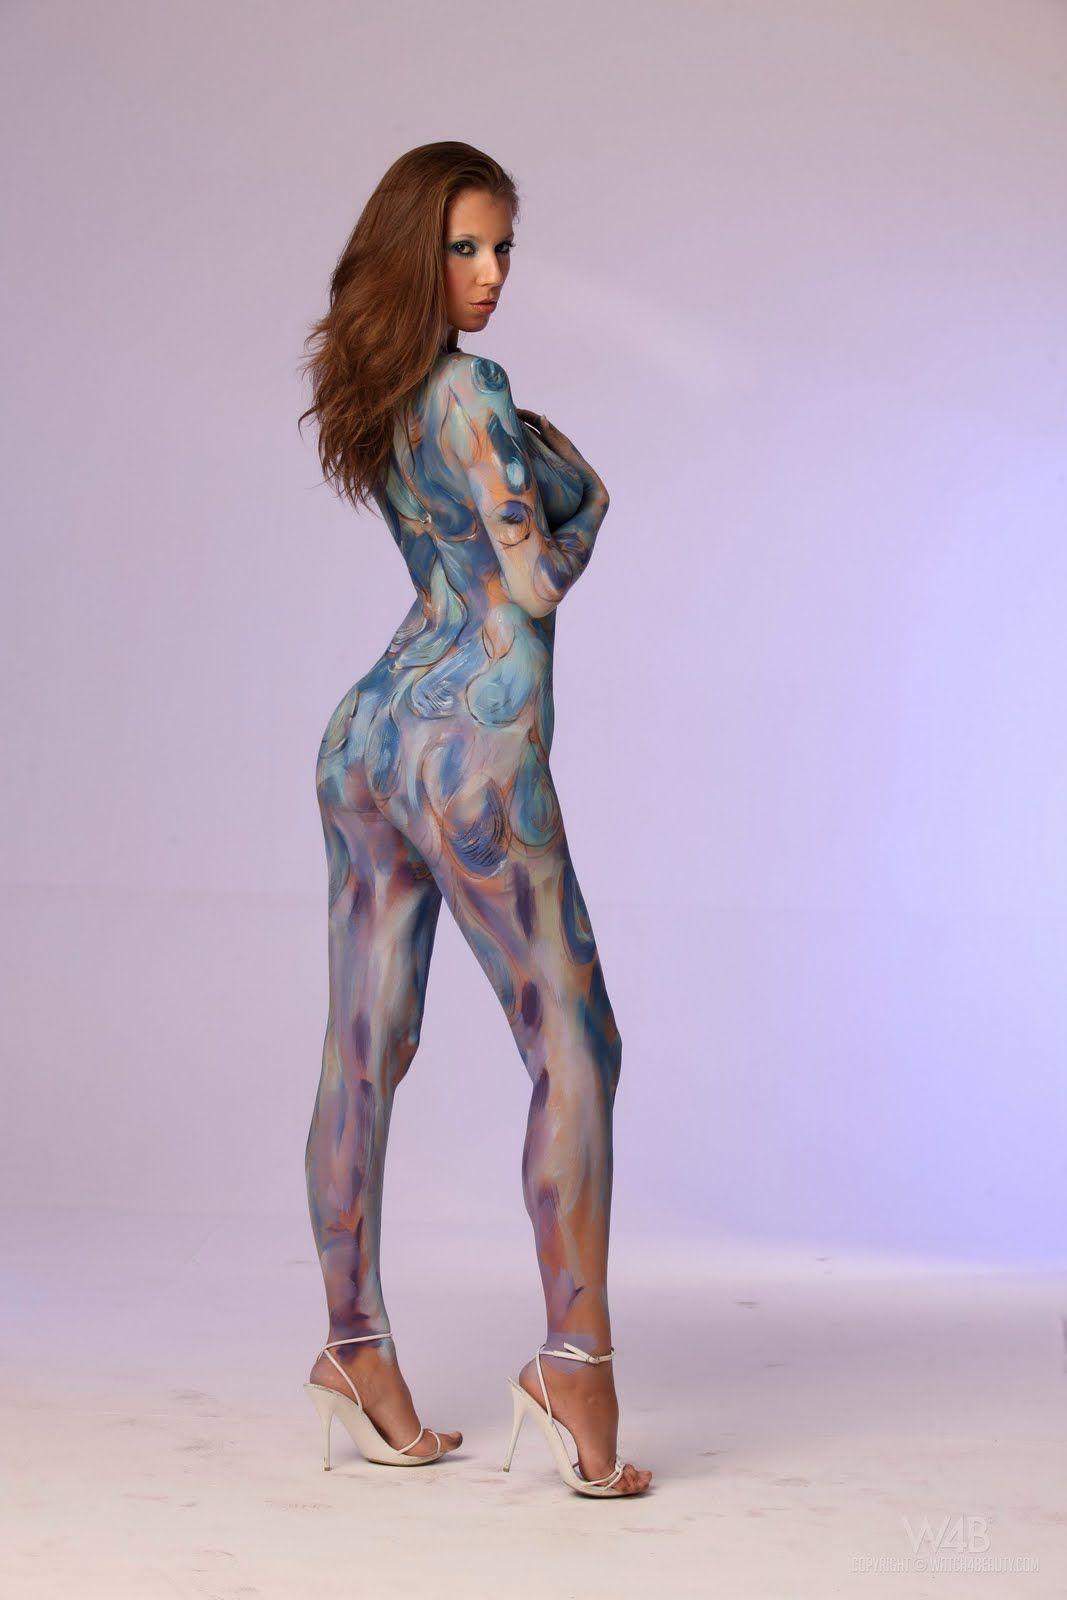 Body Painting | Body painting, Girl body, Girl